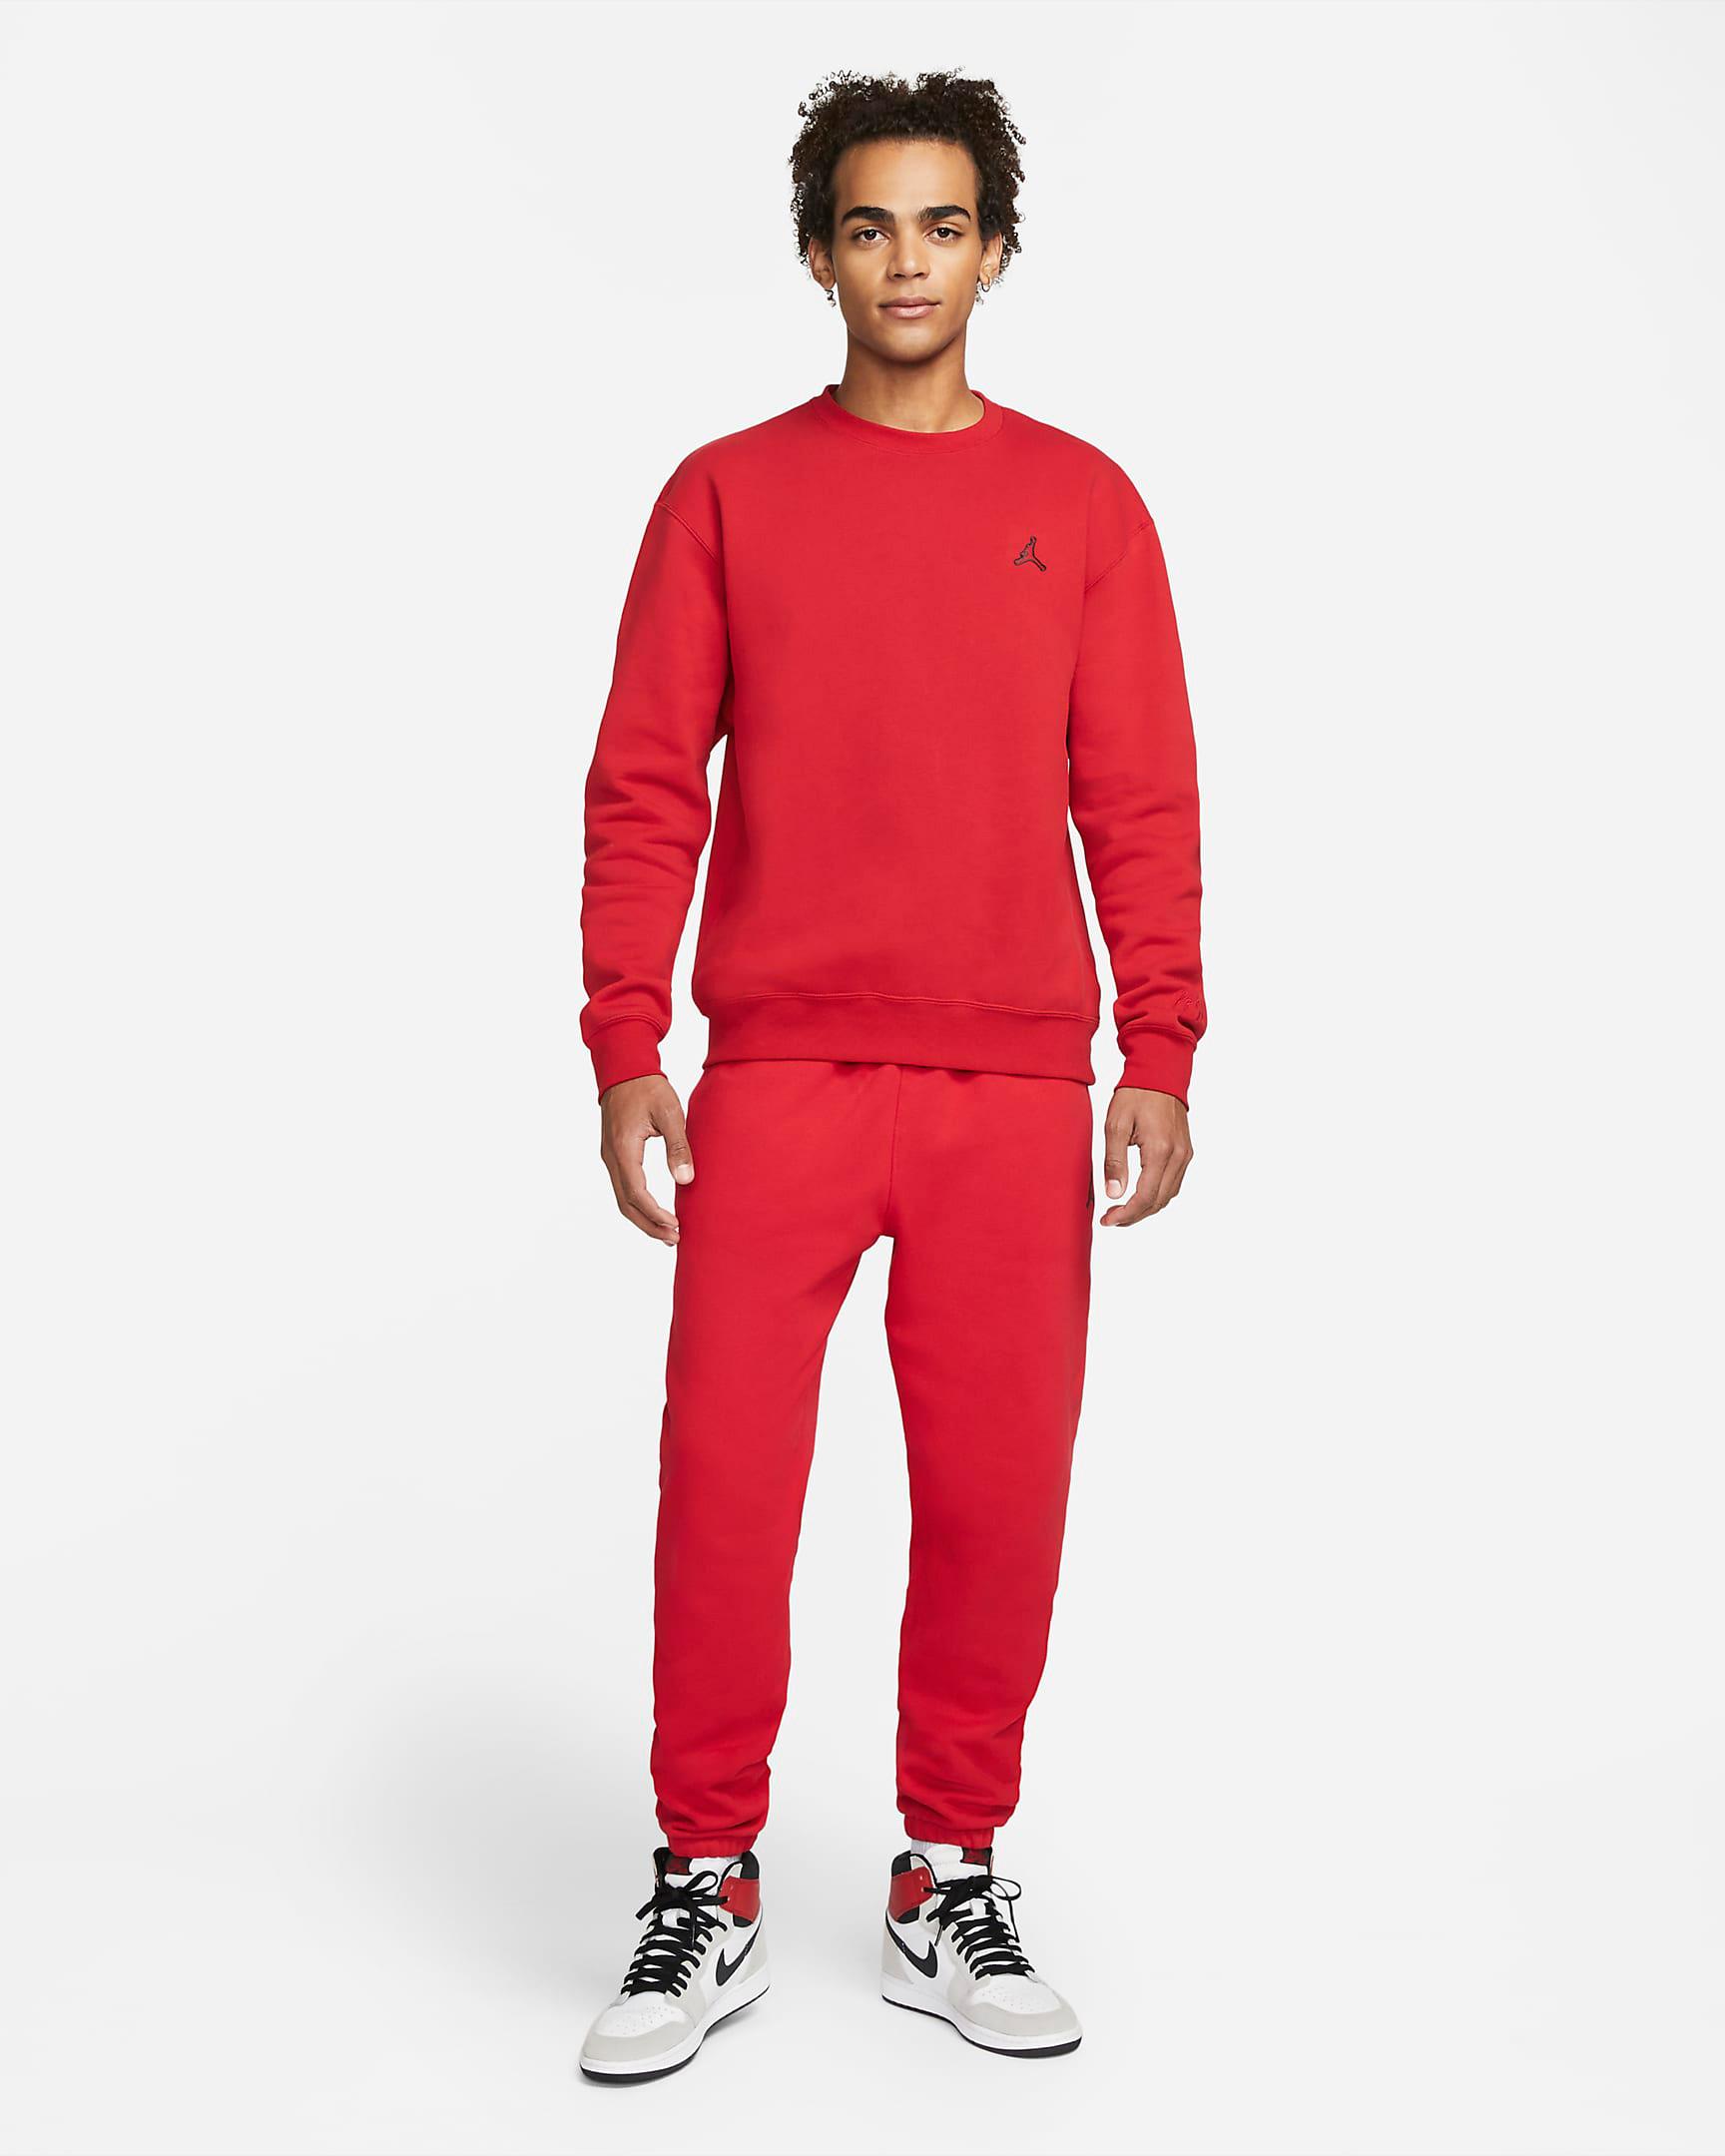 jordan-gym-red-sweatshirt-pants-outfit